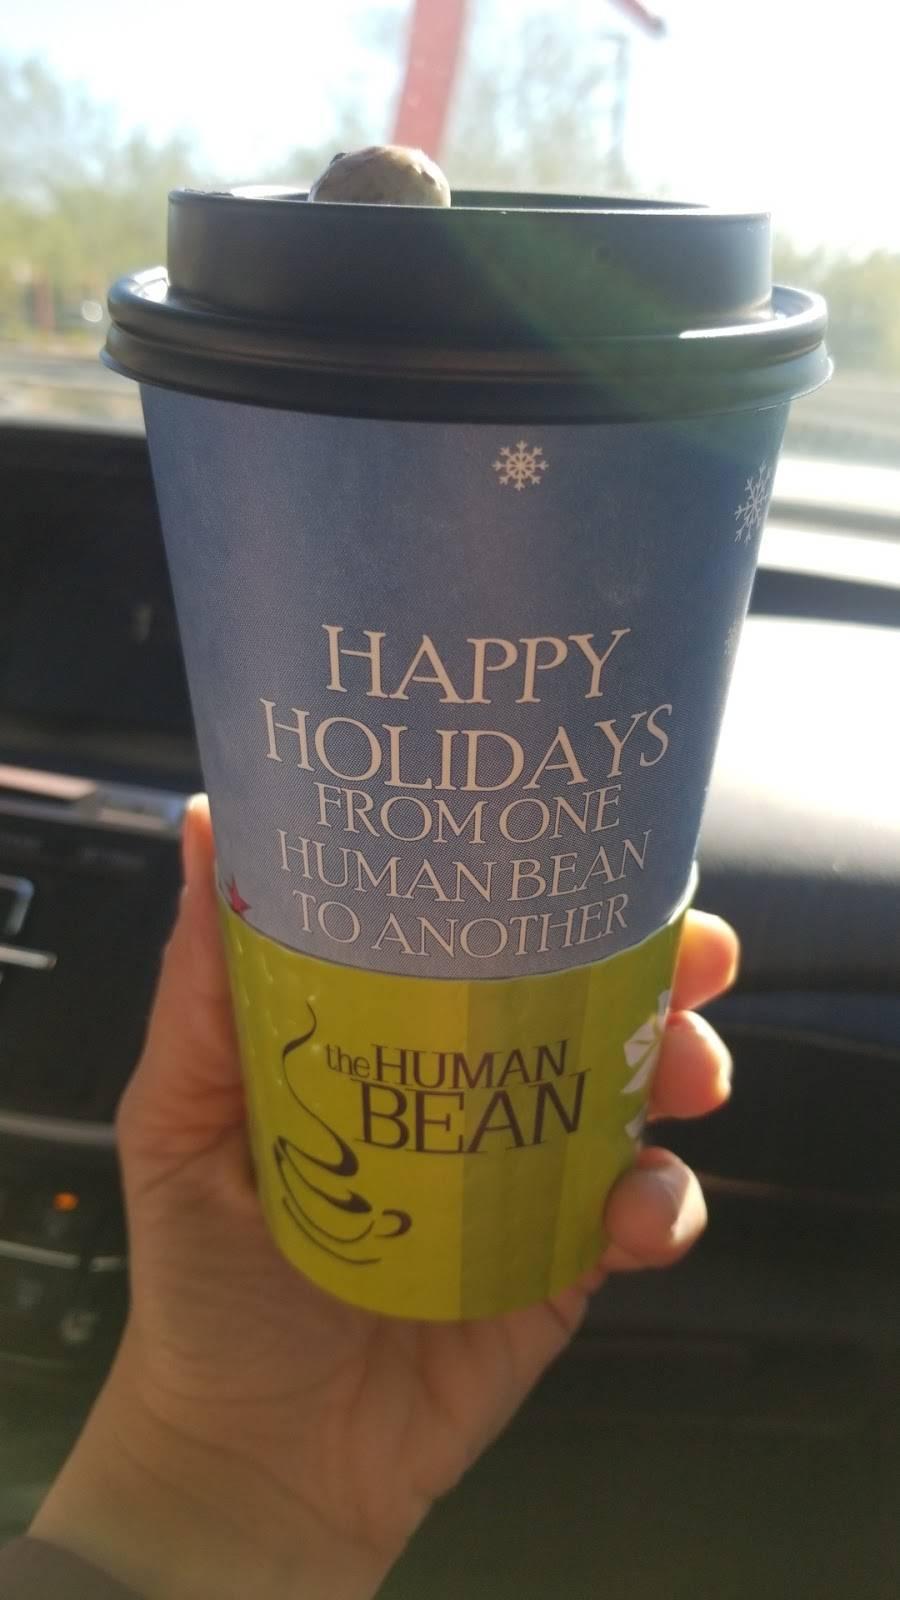 The Human Bean - cafe  | Photo 3 of 7 | Address: 20055 N 19th Ave, Phoenix, AZ 85027, USA | Phone: (623) 440-4410